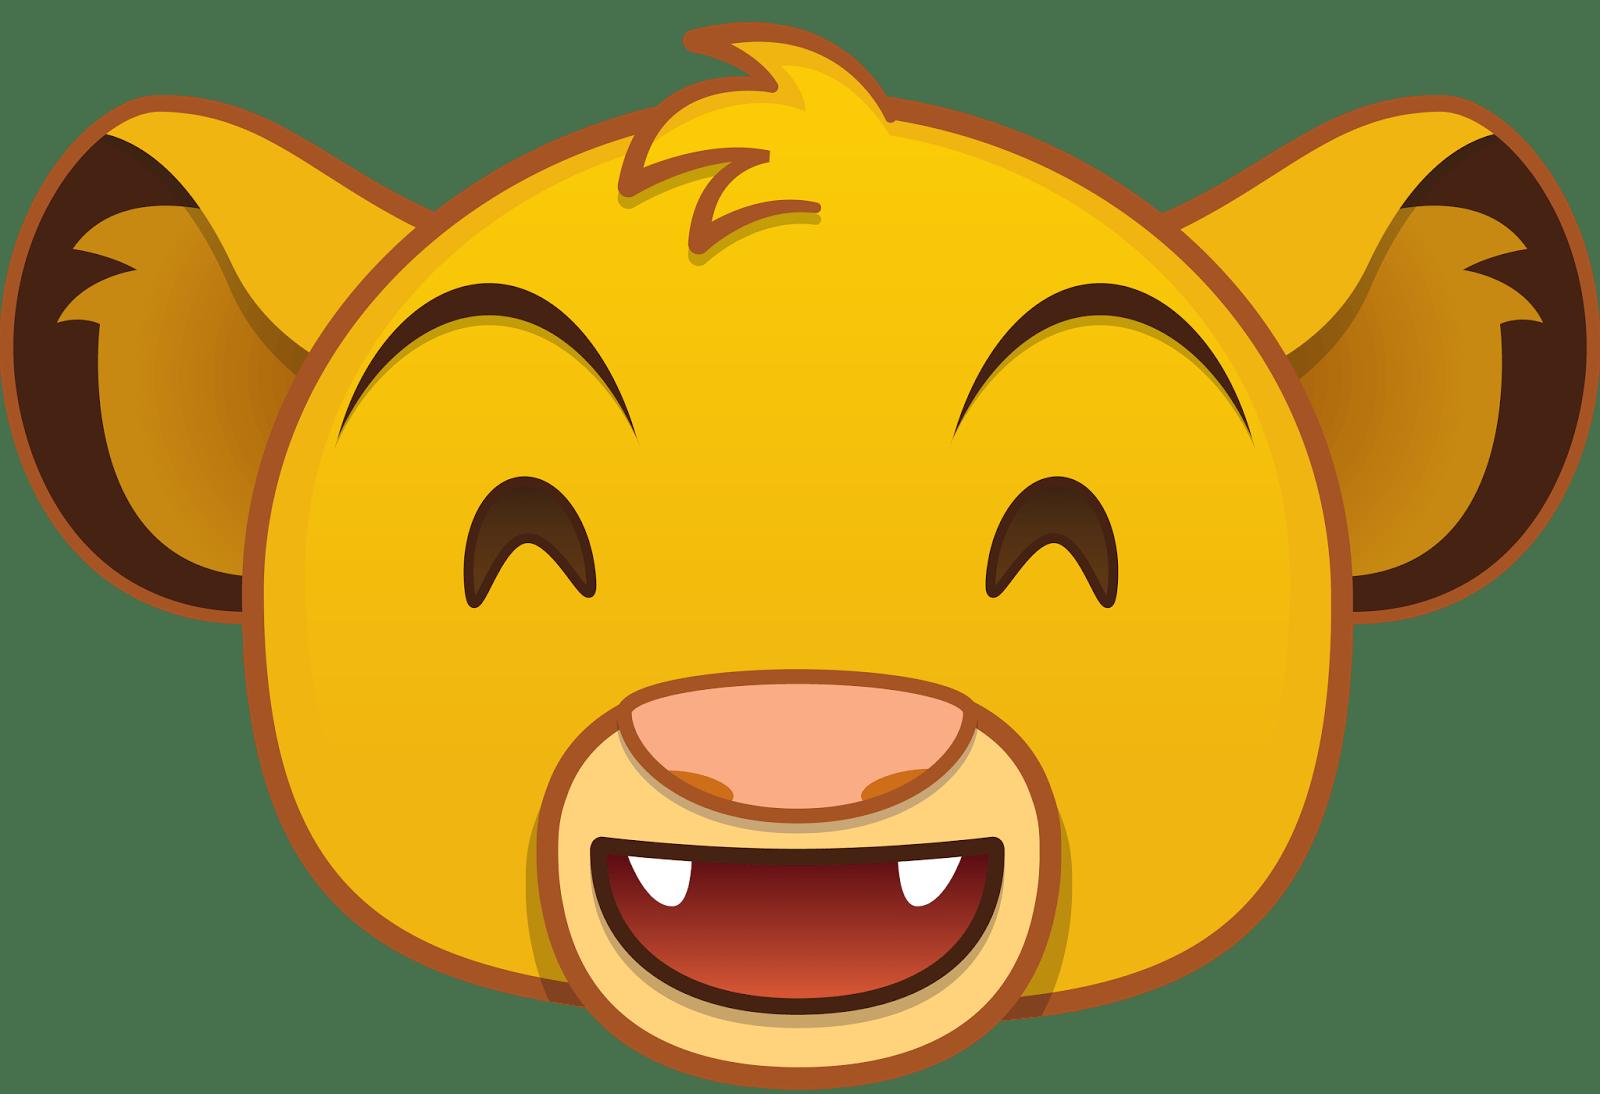 Transparent png stickpng lion. Emoji clipart fire